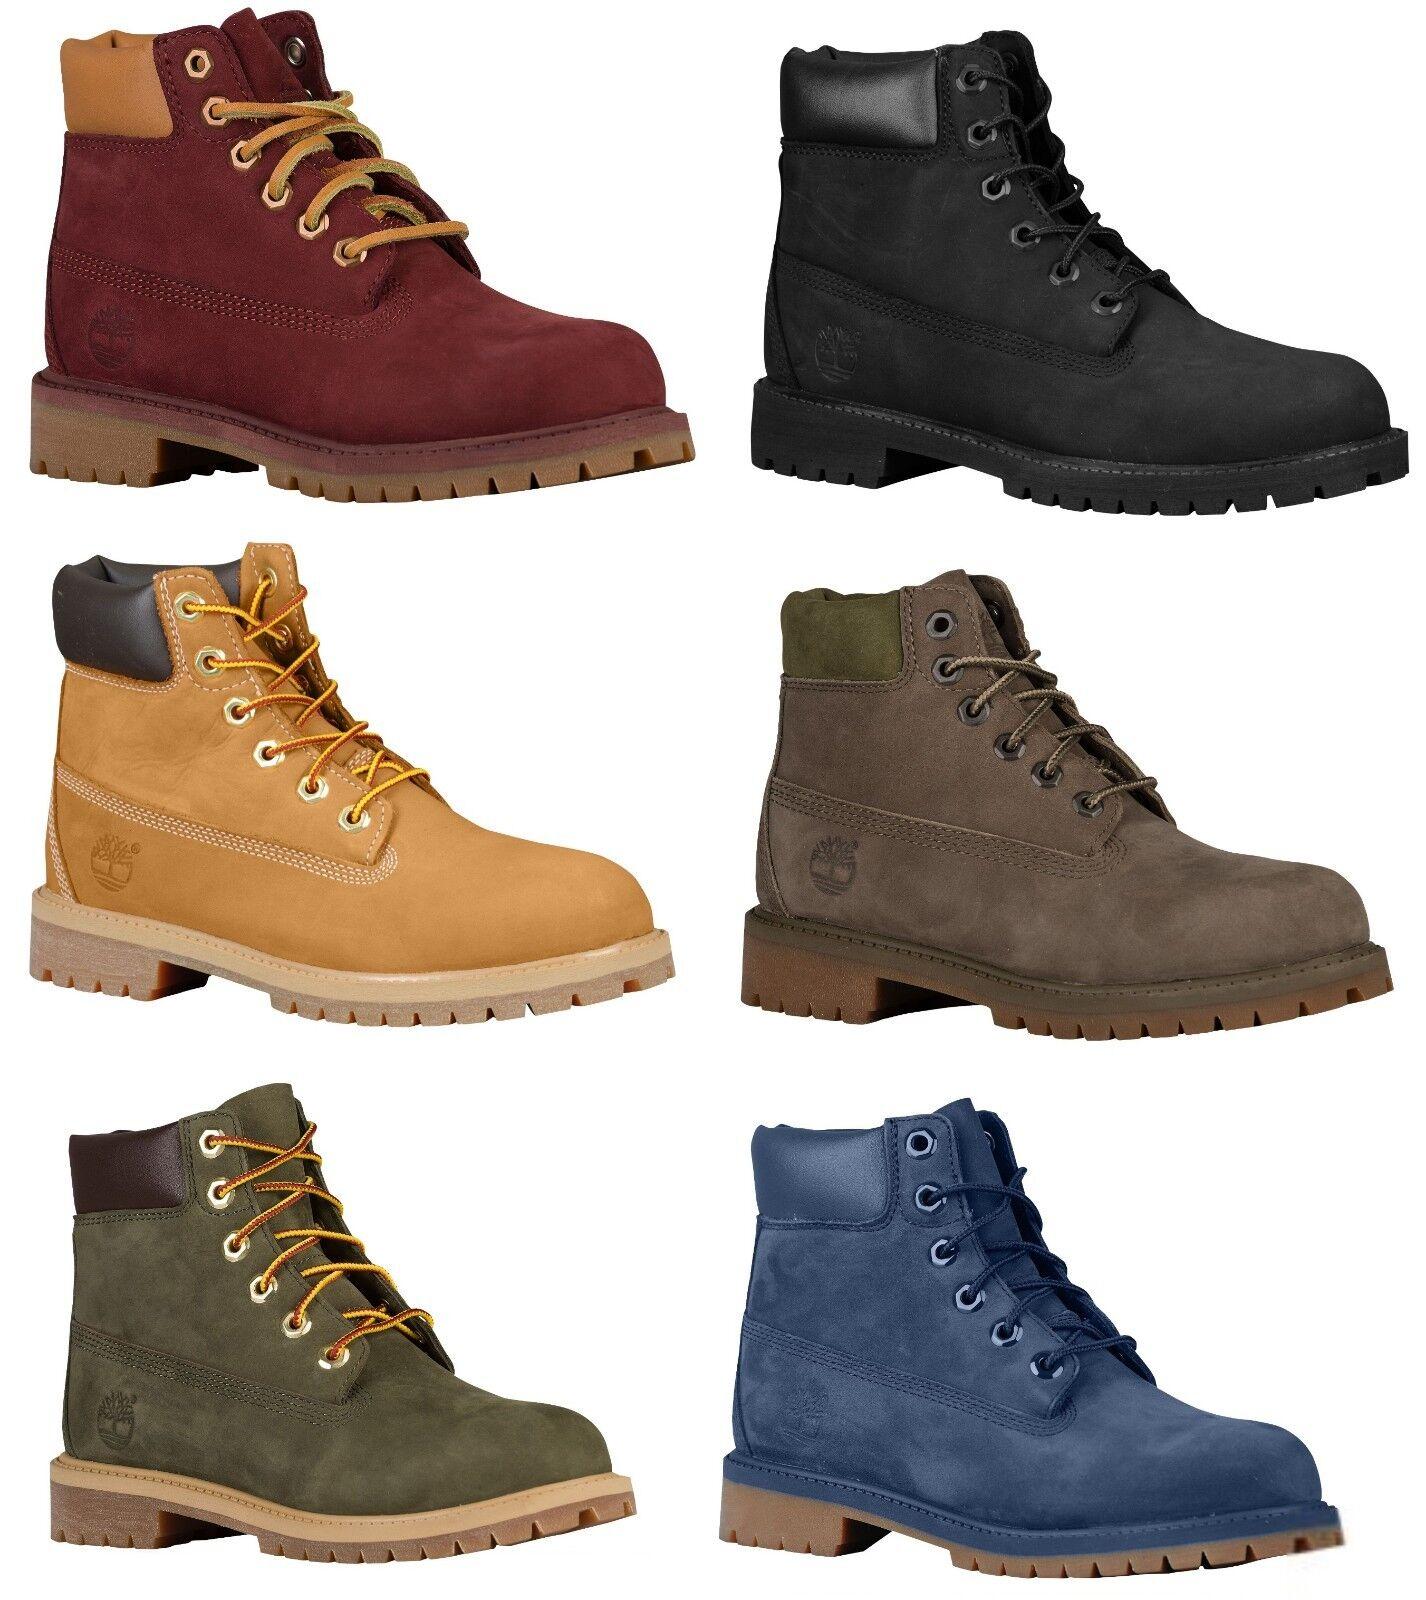 "Timberland  6"" PREMIUM WATERPROOF BOOTS Boys' Grade School Youth GS Kids Boots"